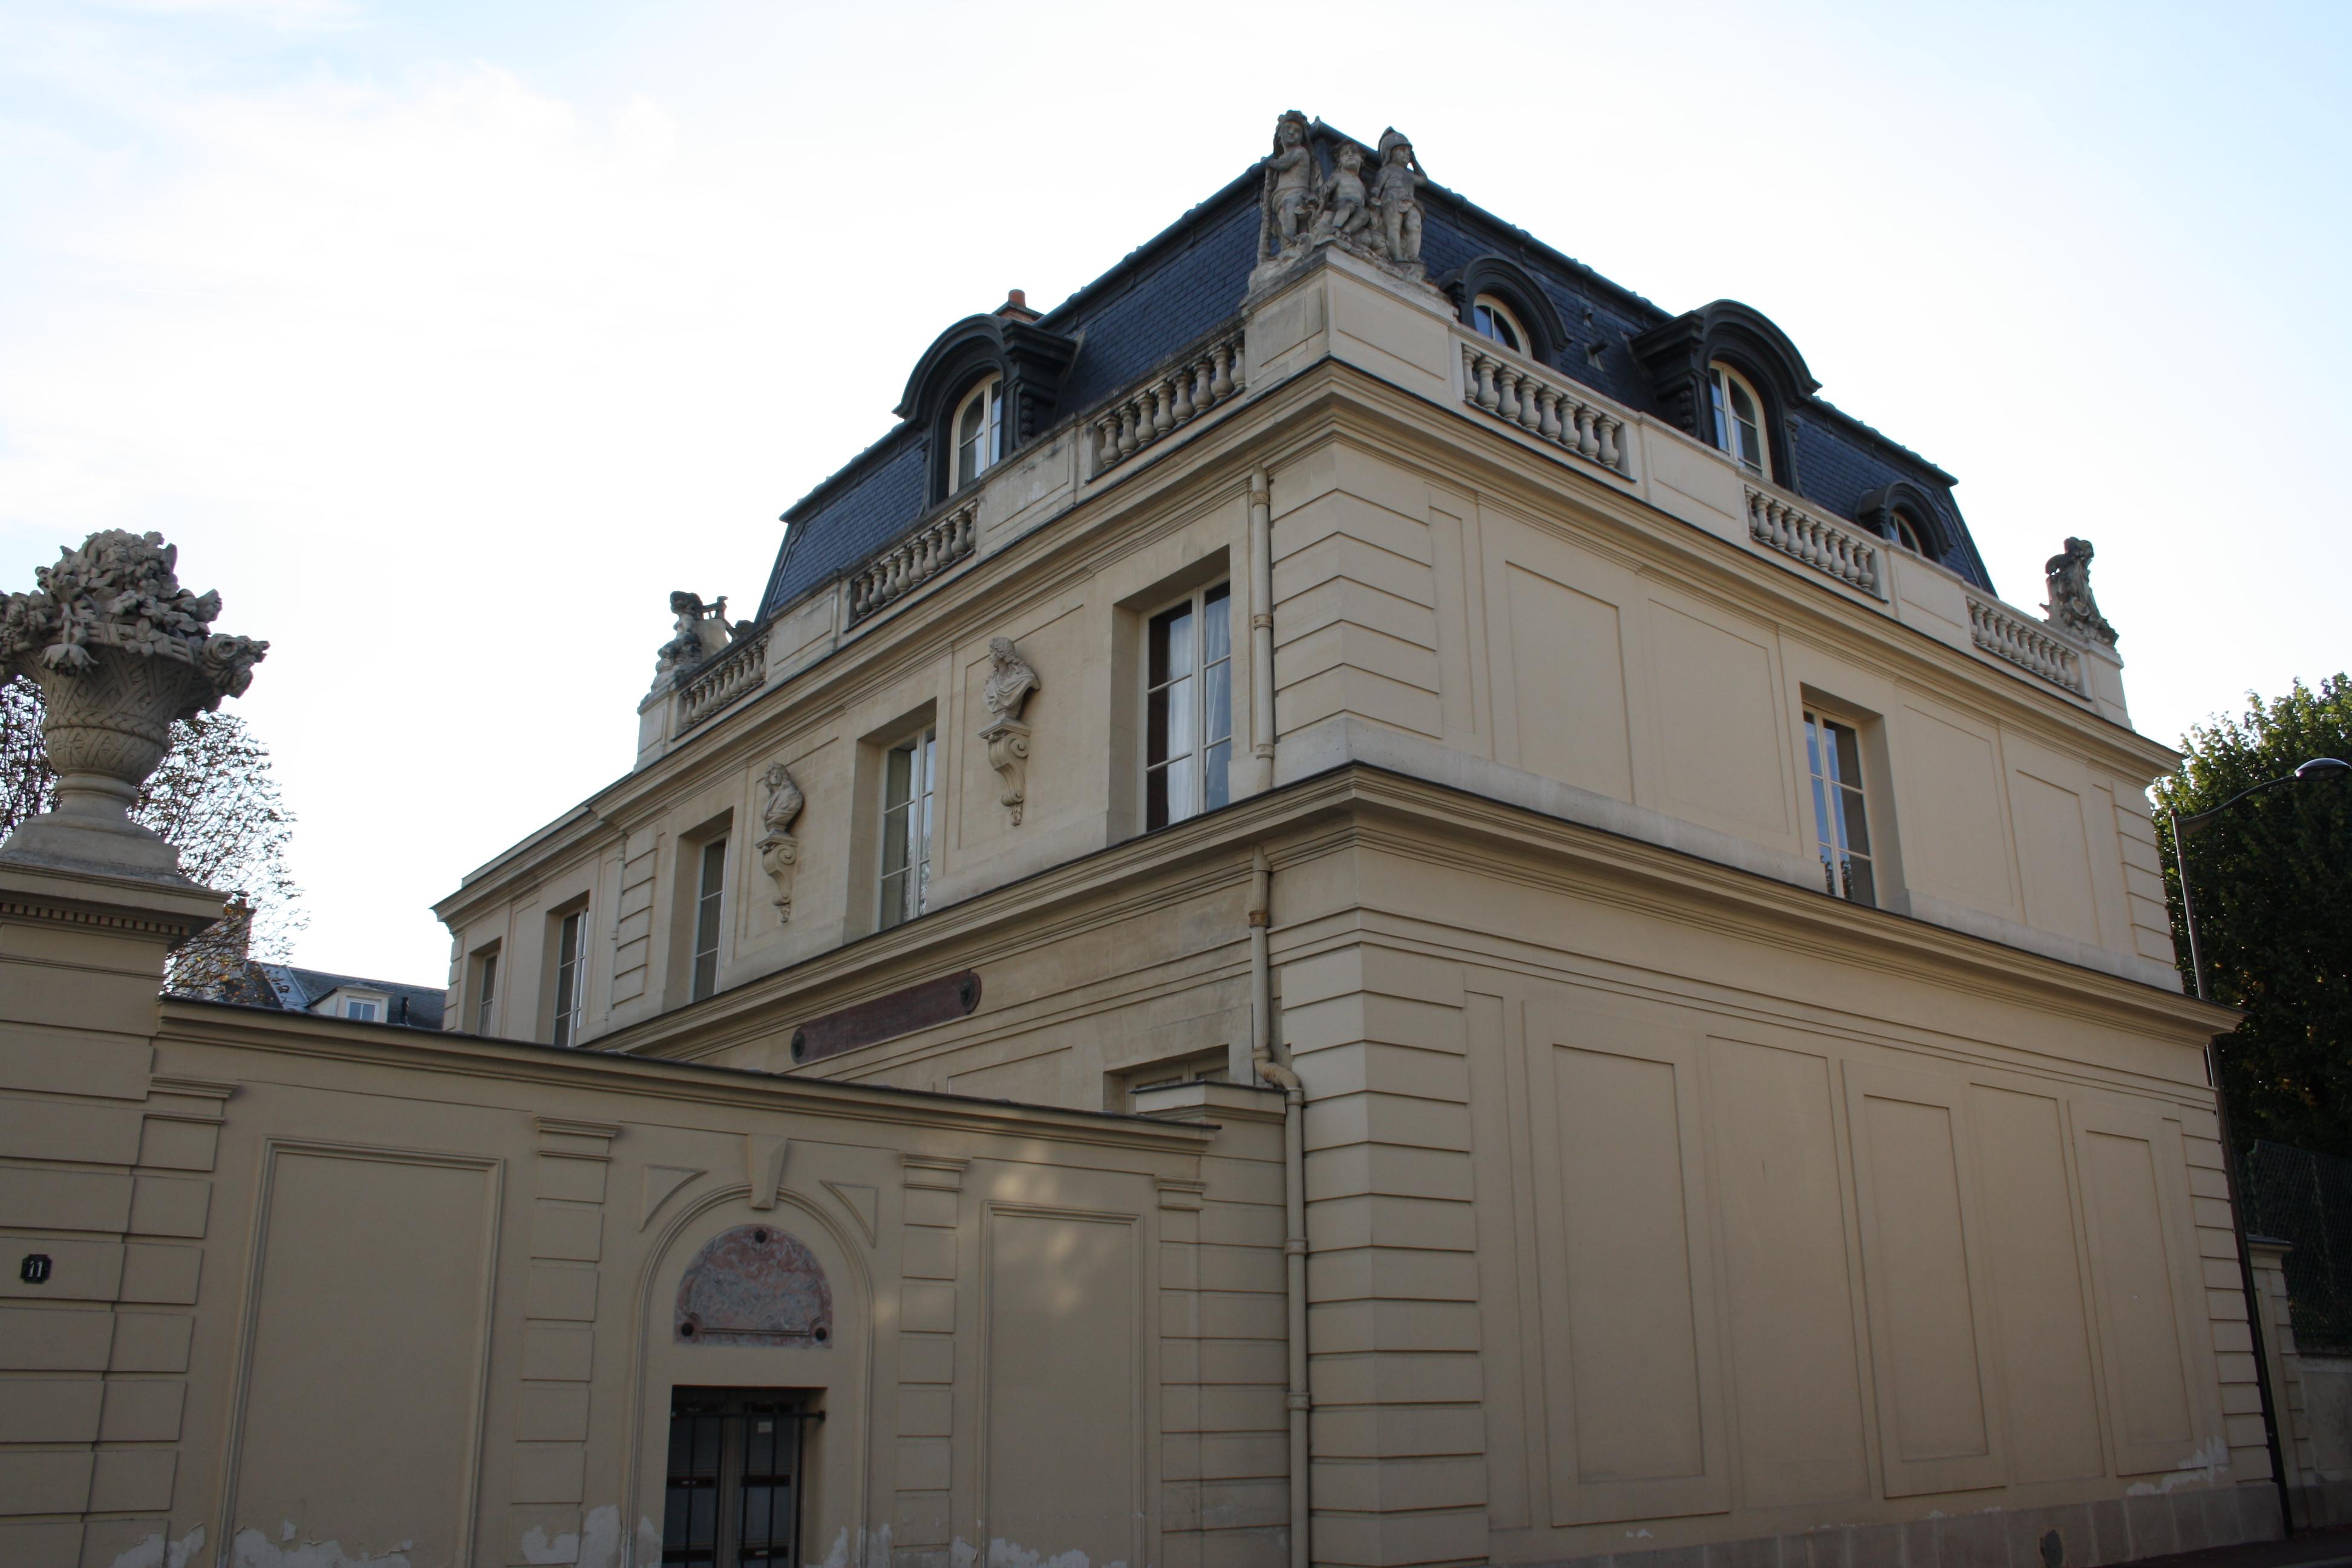 Home St Germain En Laye file:saint-germain-en-laye hôtel de noailles 2011 13